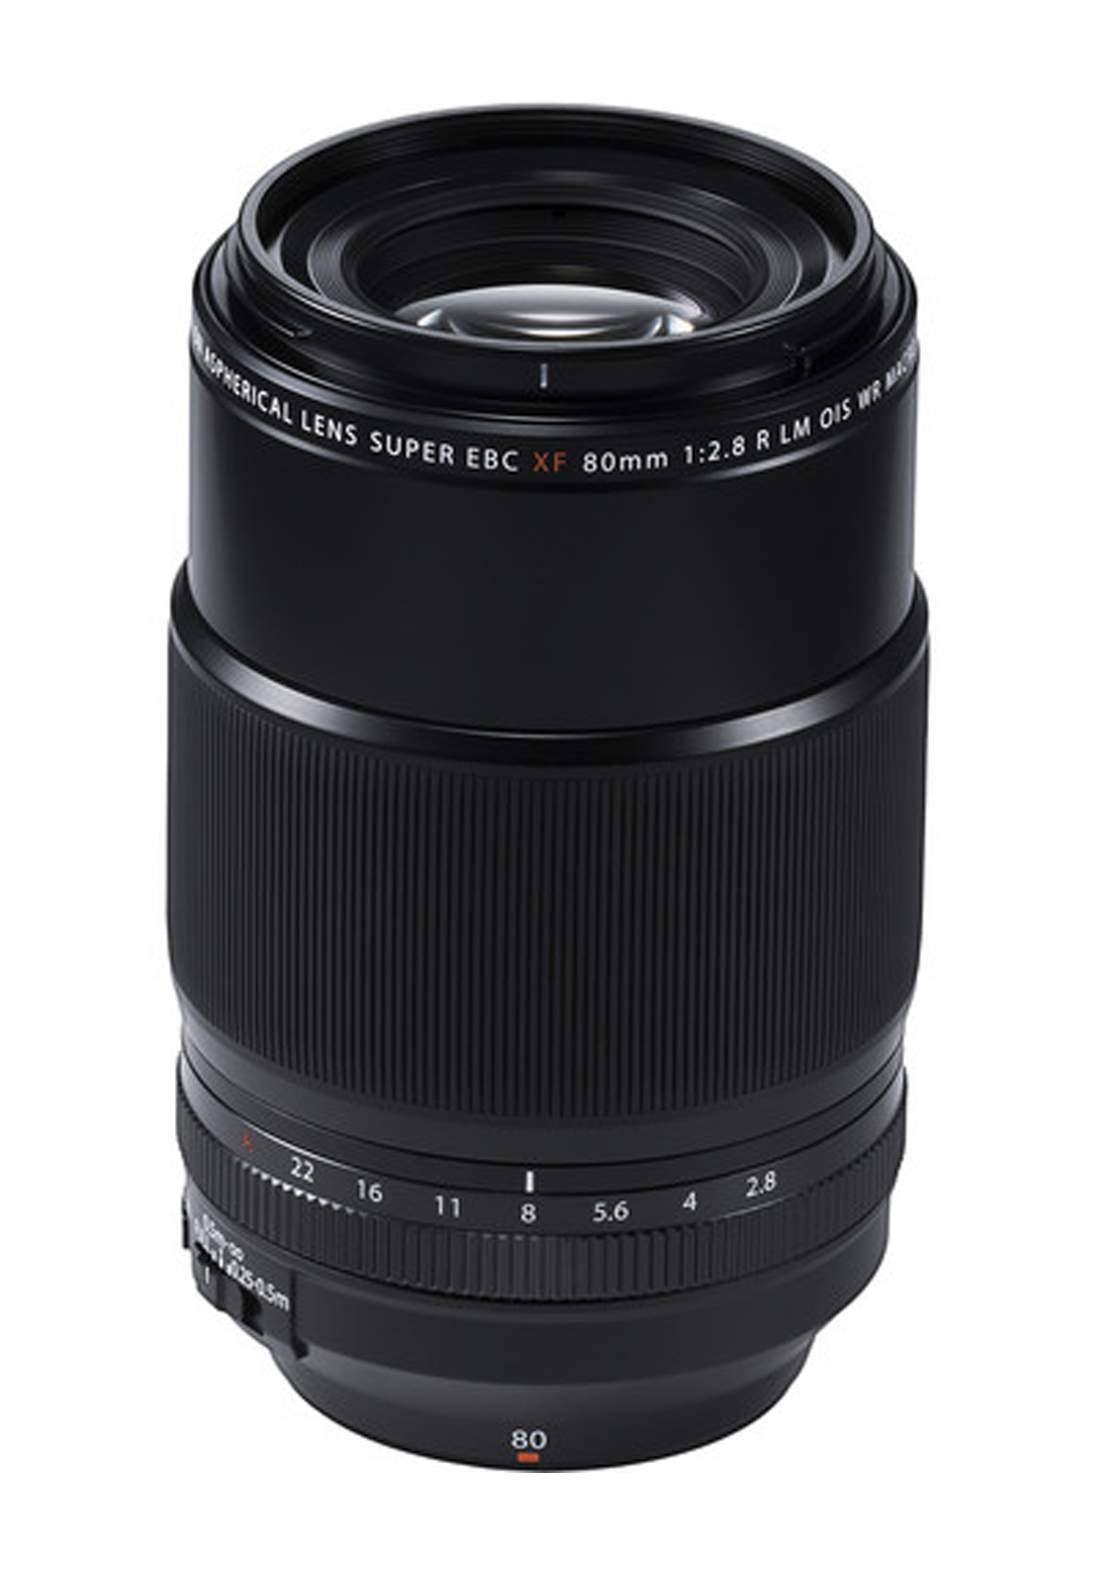 Fujifilm  XF 80mm F2.8 R LM OIS WR Macro Lens  - Black عدسة كاميرا